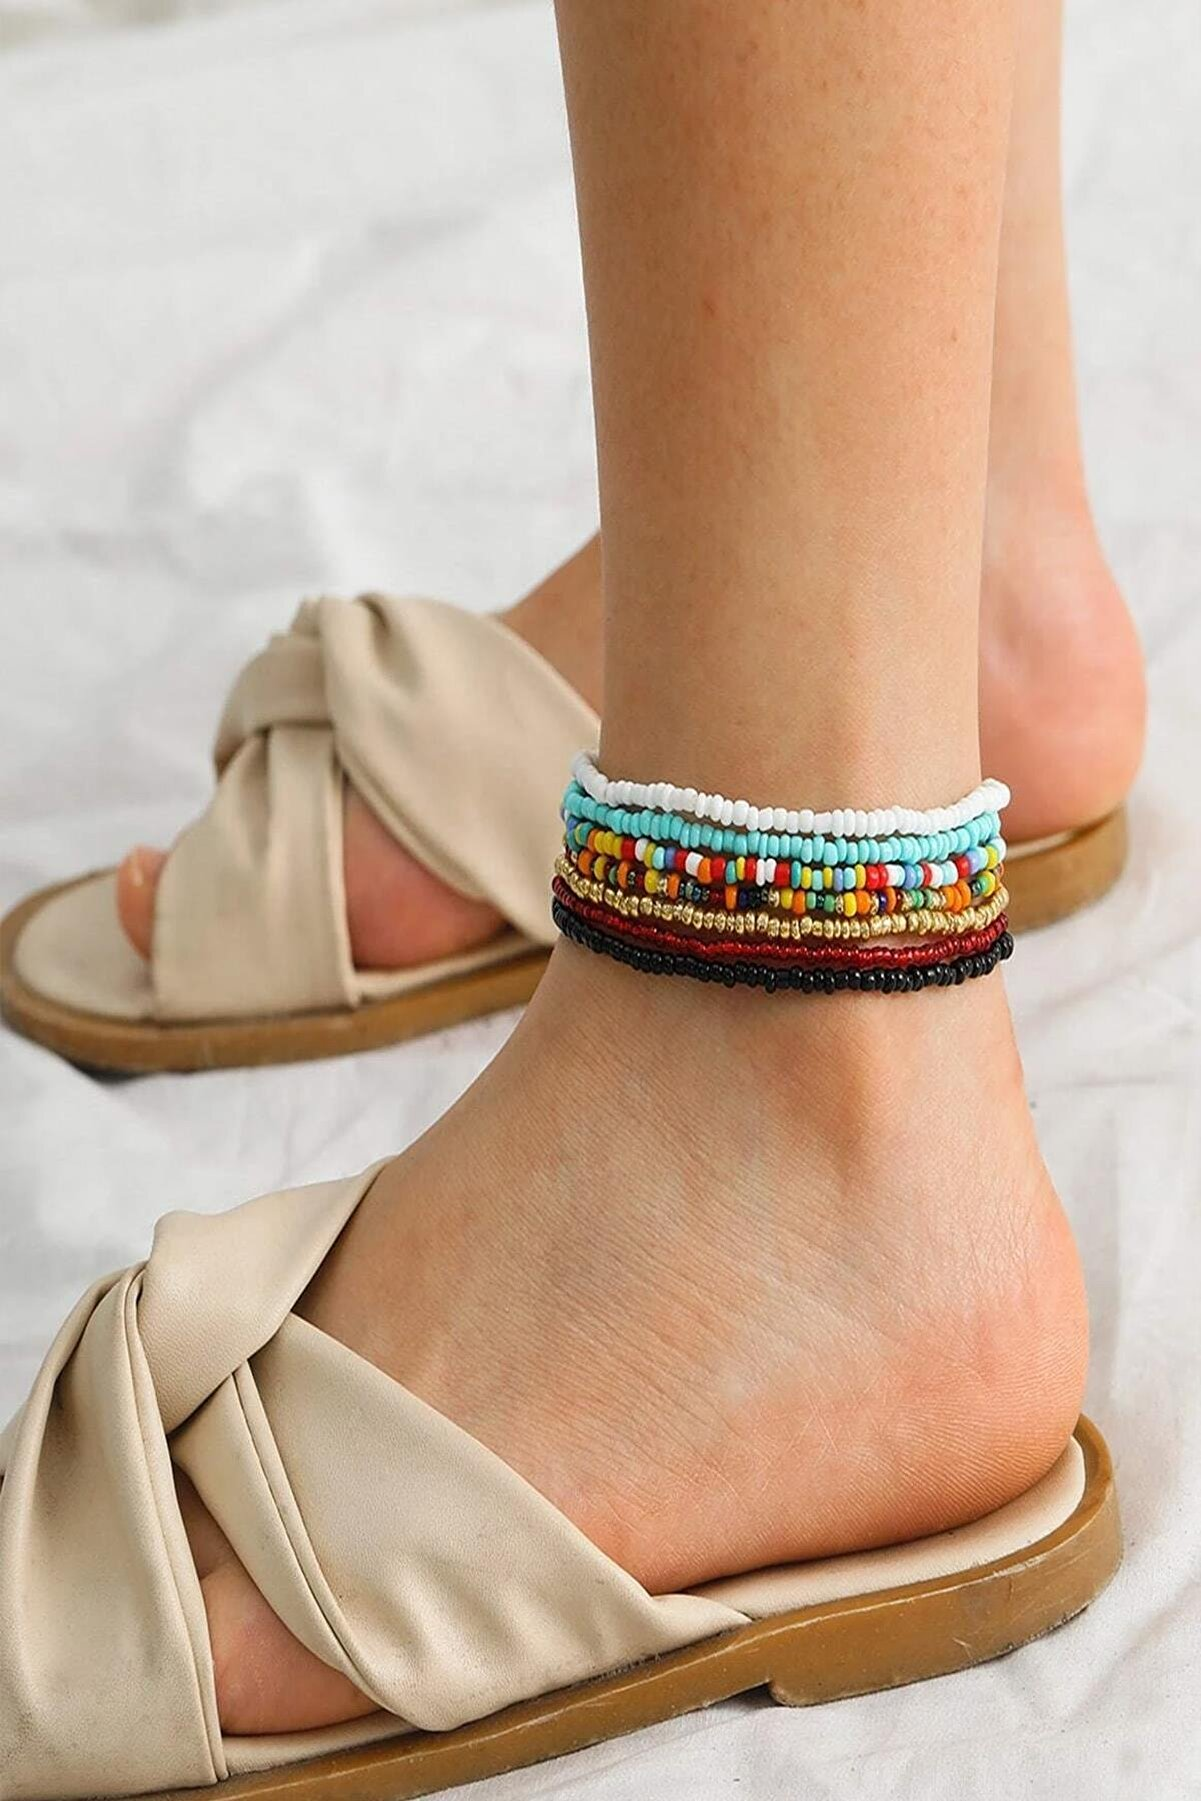 New Obsessions Gypsy Girl Boncuk Halhal Seti